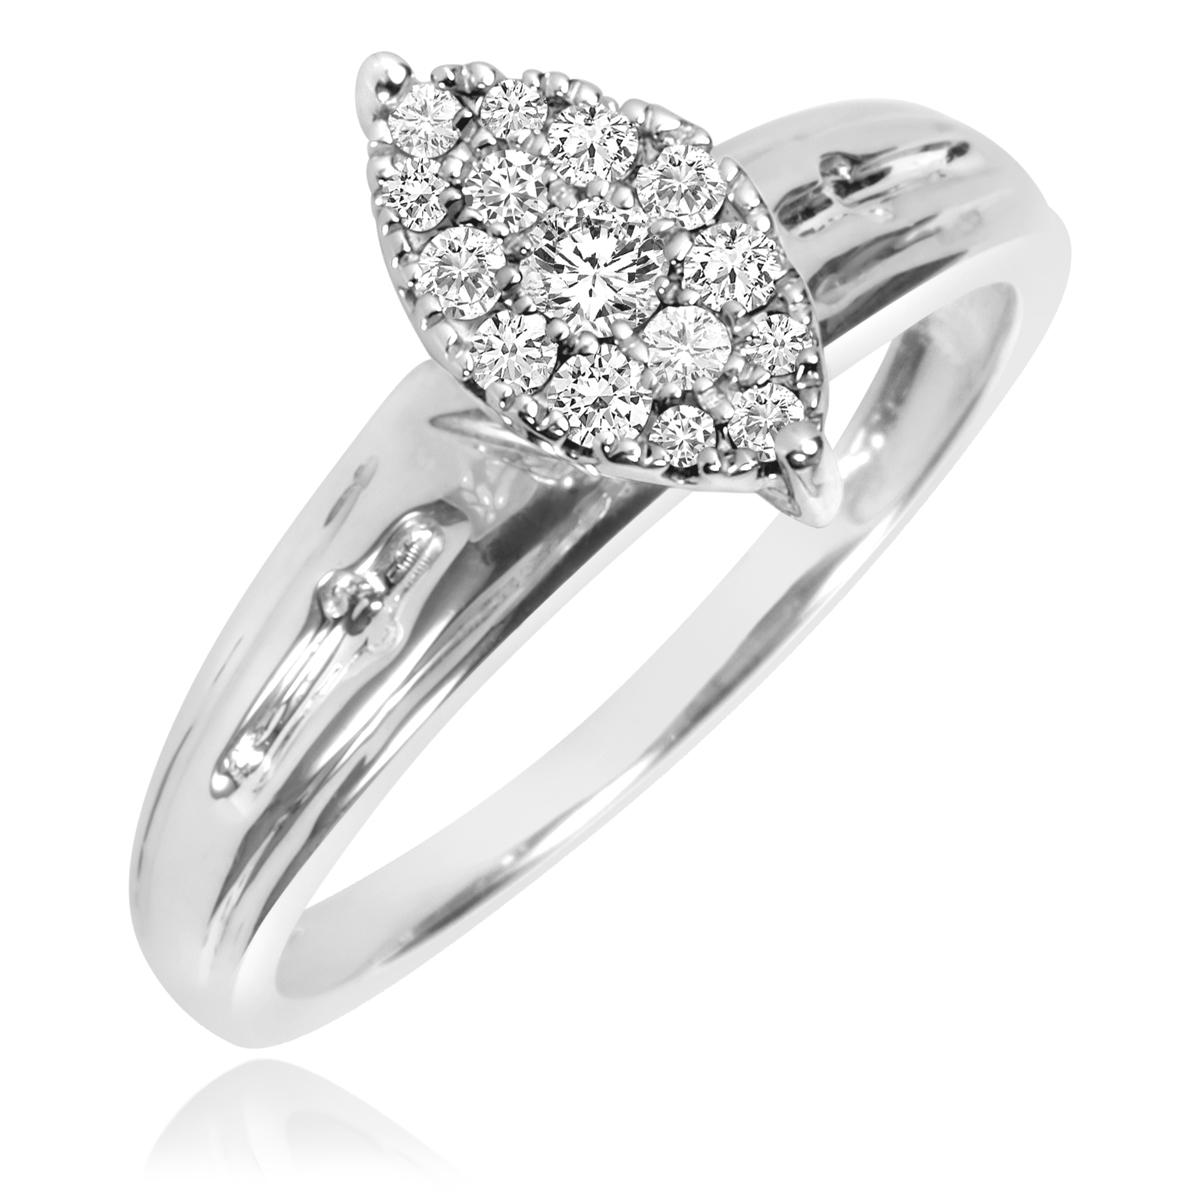 1/5 Carat T.W. Round Cut Diamond Ladies Engagement Ring 10K White Gold- Size 8